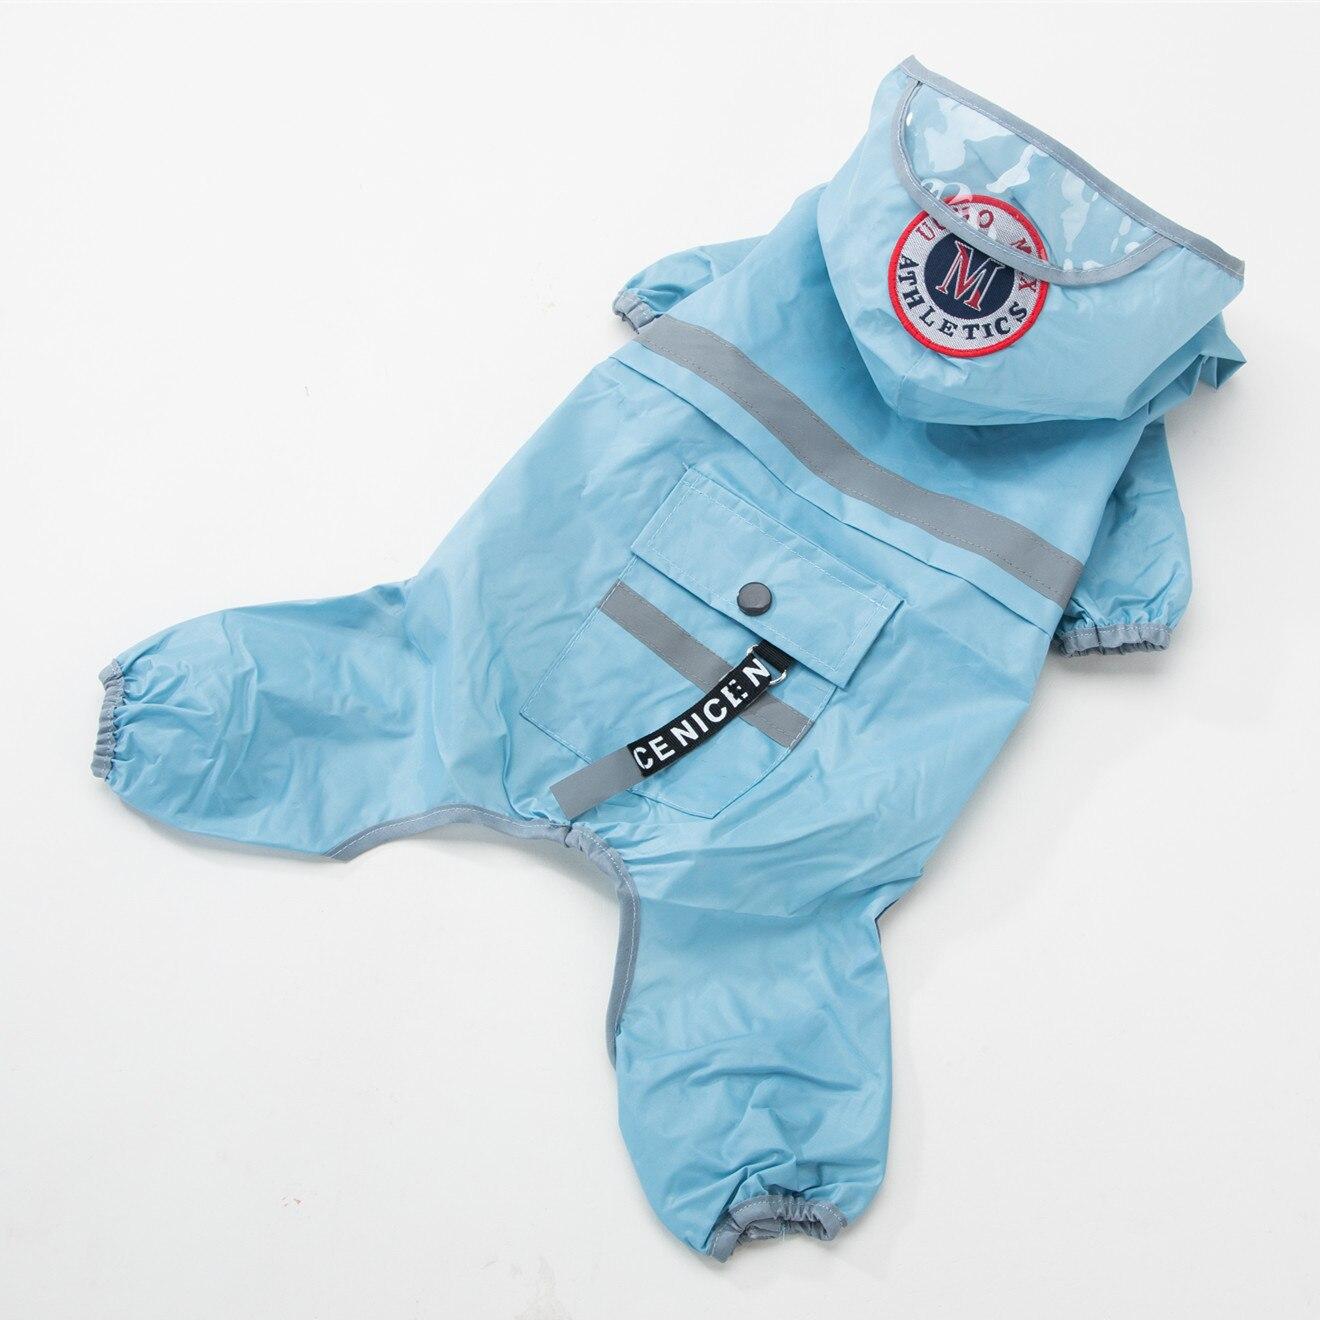 Dog Raincoat Dog Translucent Hat Dog Raincoat Hood Waterproof Overalls Jumpsuit Rain Suit For Small Dog Yorkshire Chihuahua